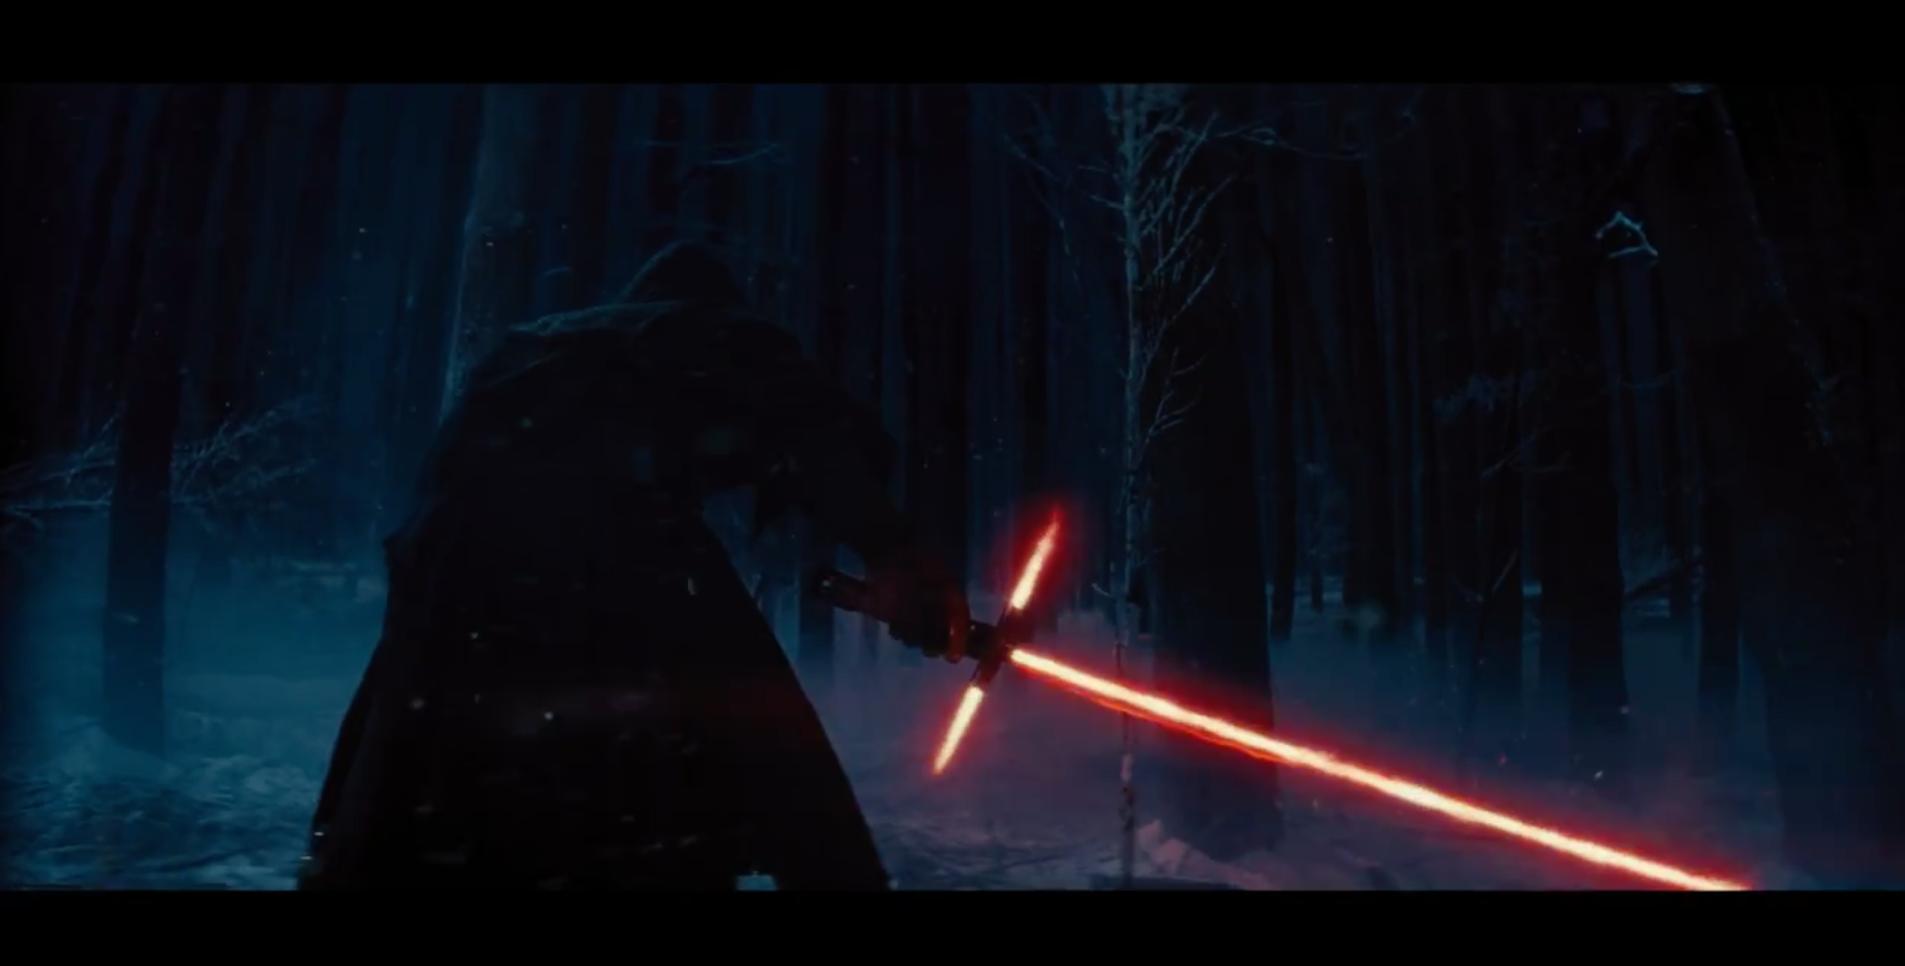 Cosa penso del teaser trailer di Star Wars – The Force Awakens